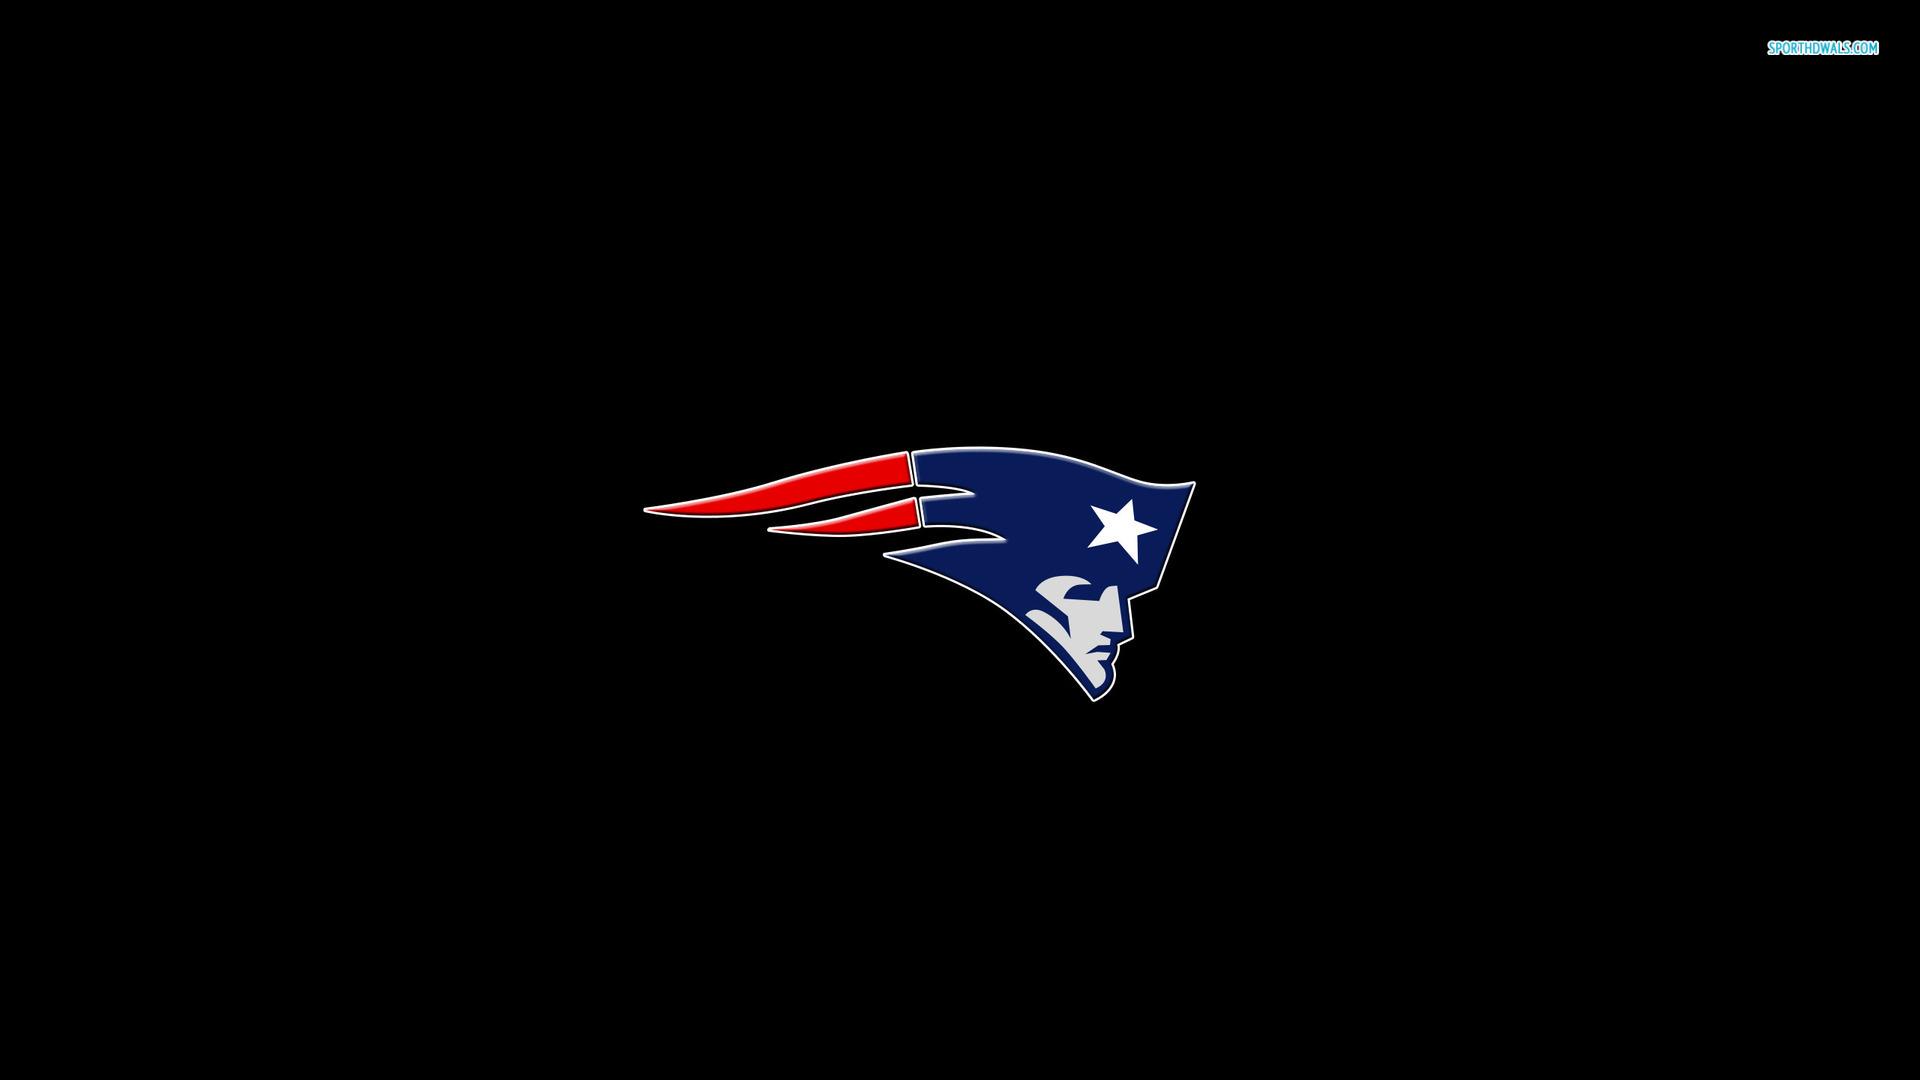 New England Patriots Phone Wallpaper